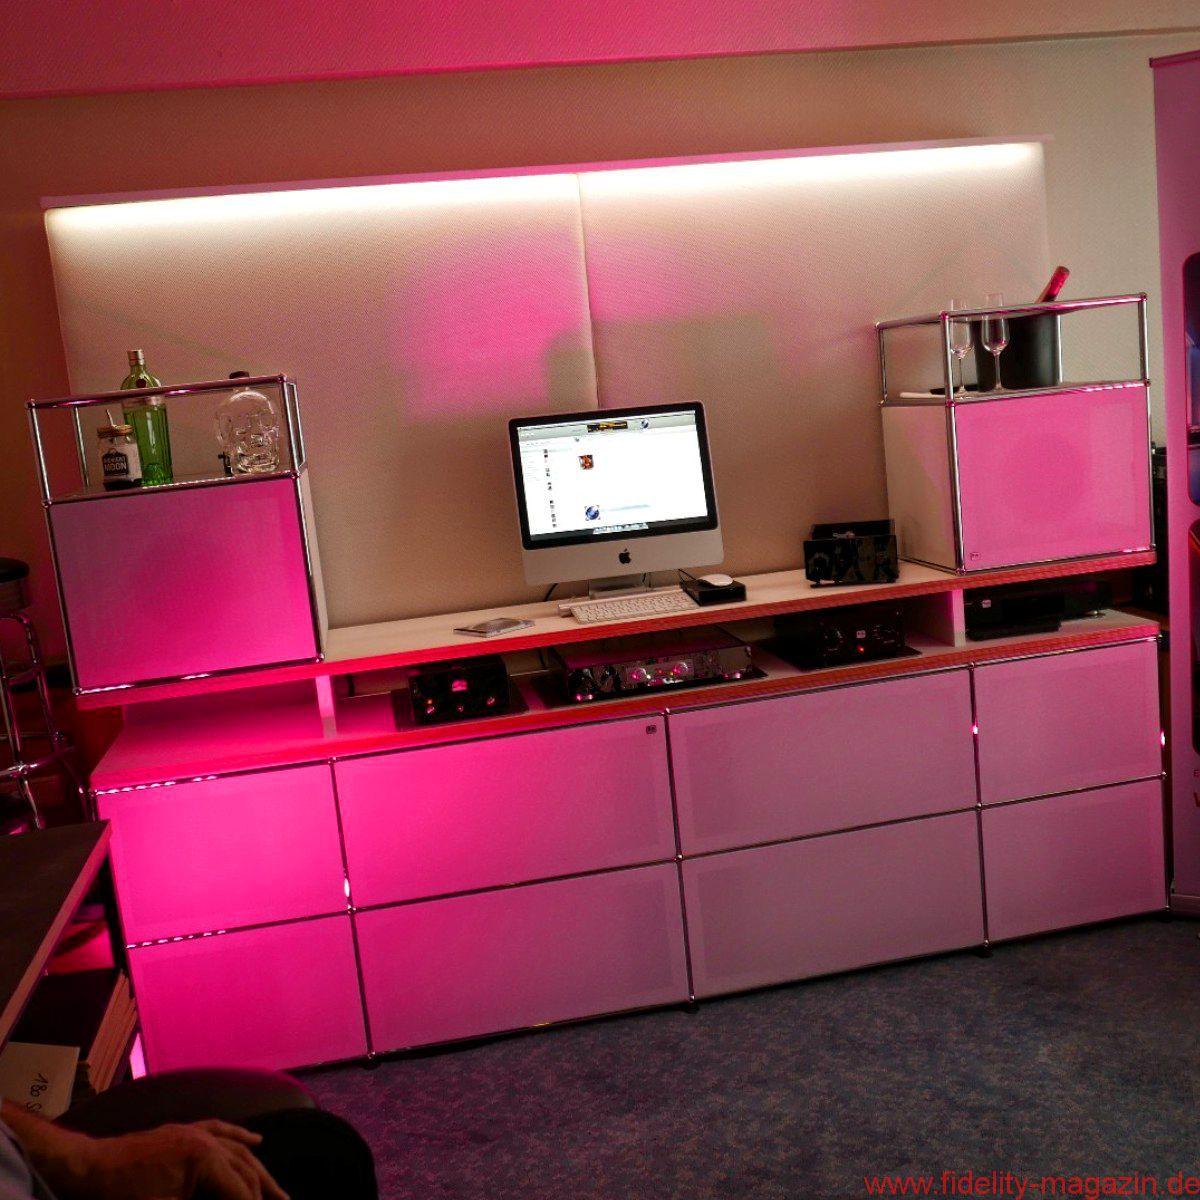 norddeutsche hifi tage 2016 hamburg 60 fidelity online. Black Bedroom Furniture Sets. Home Design Ideas